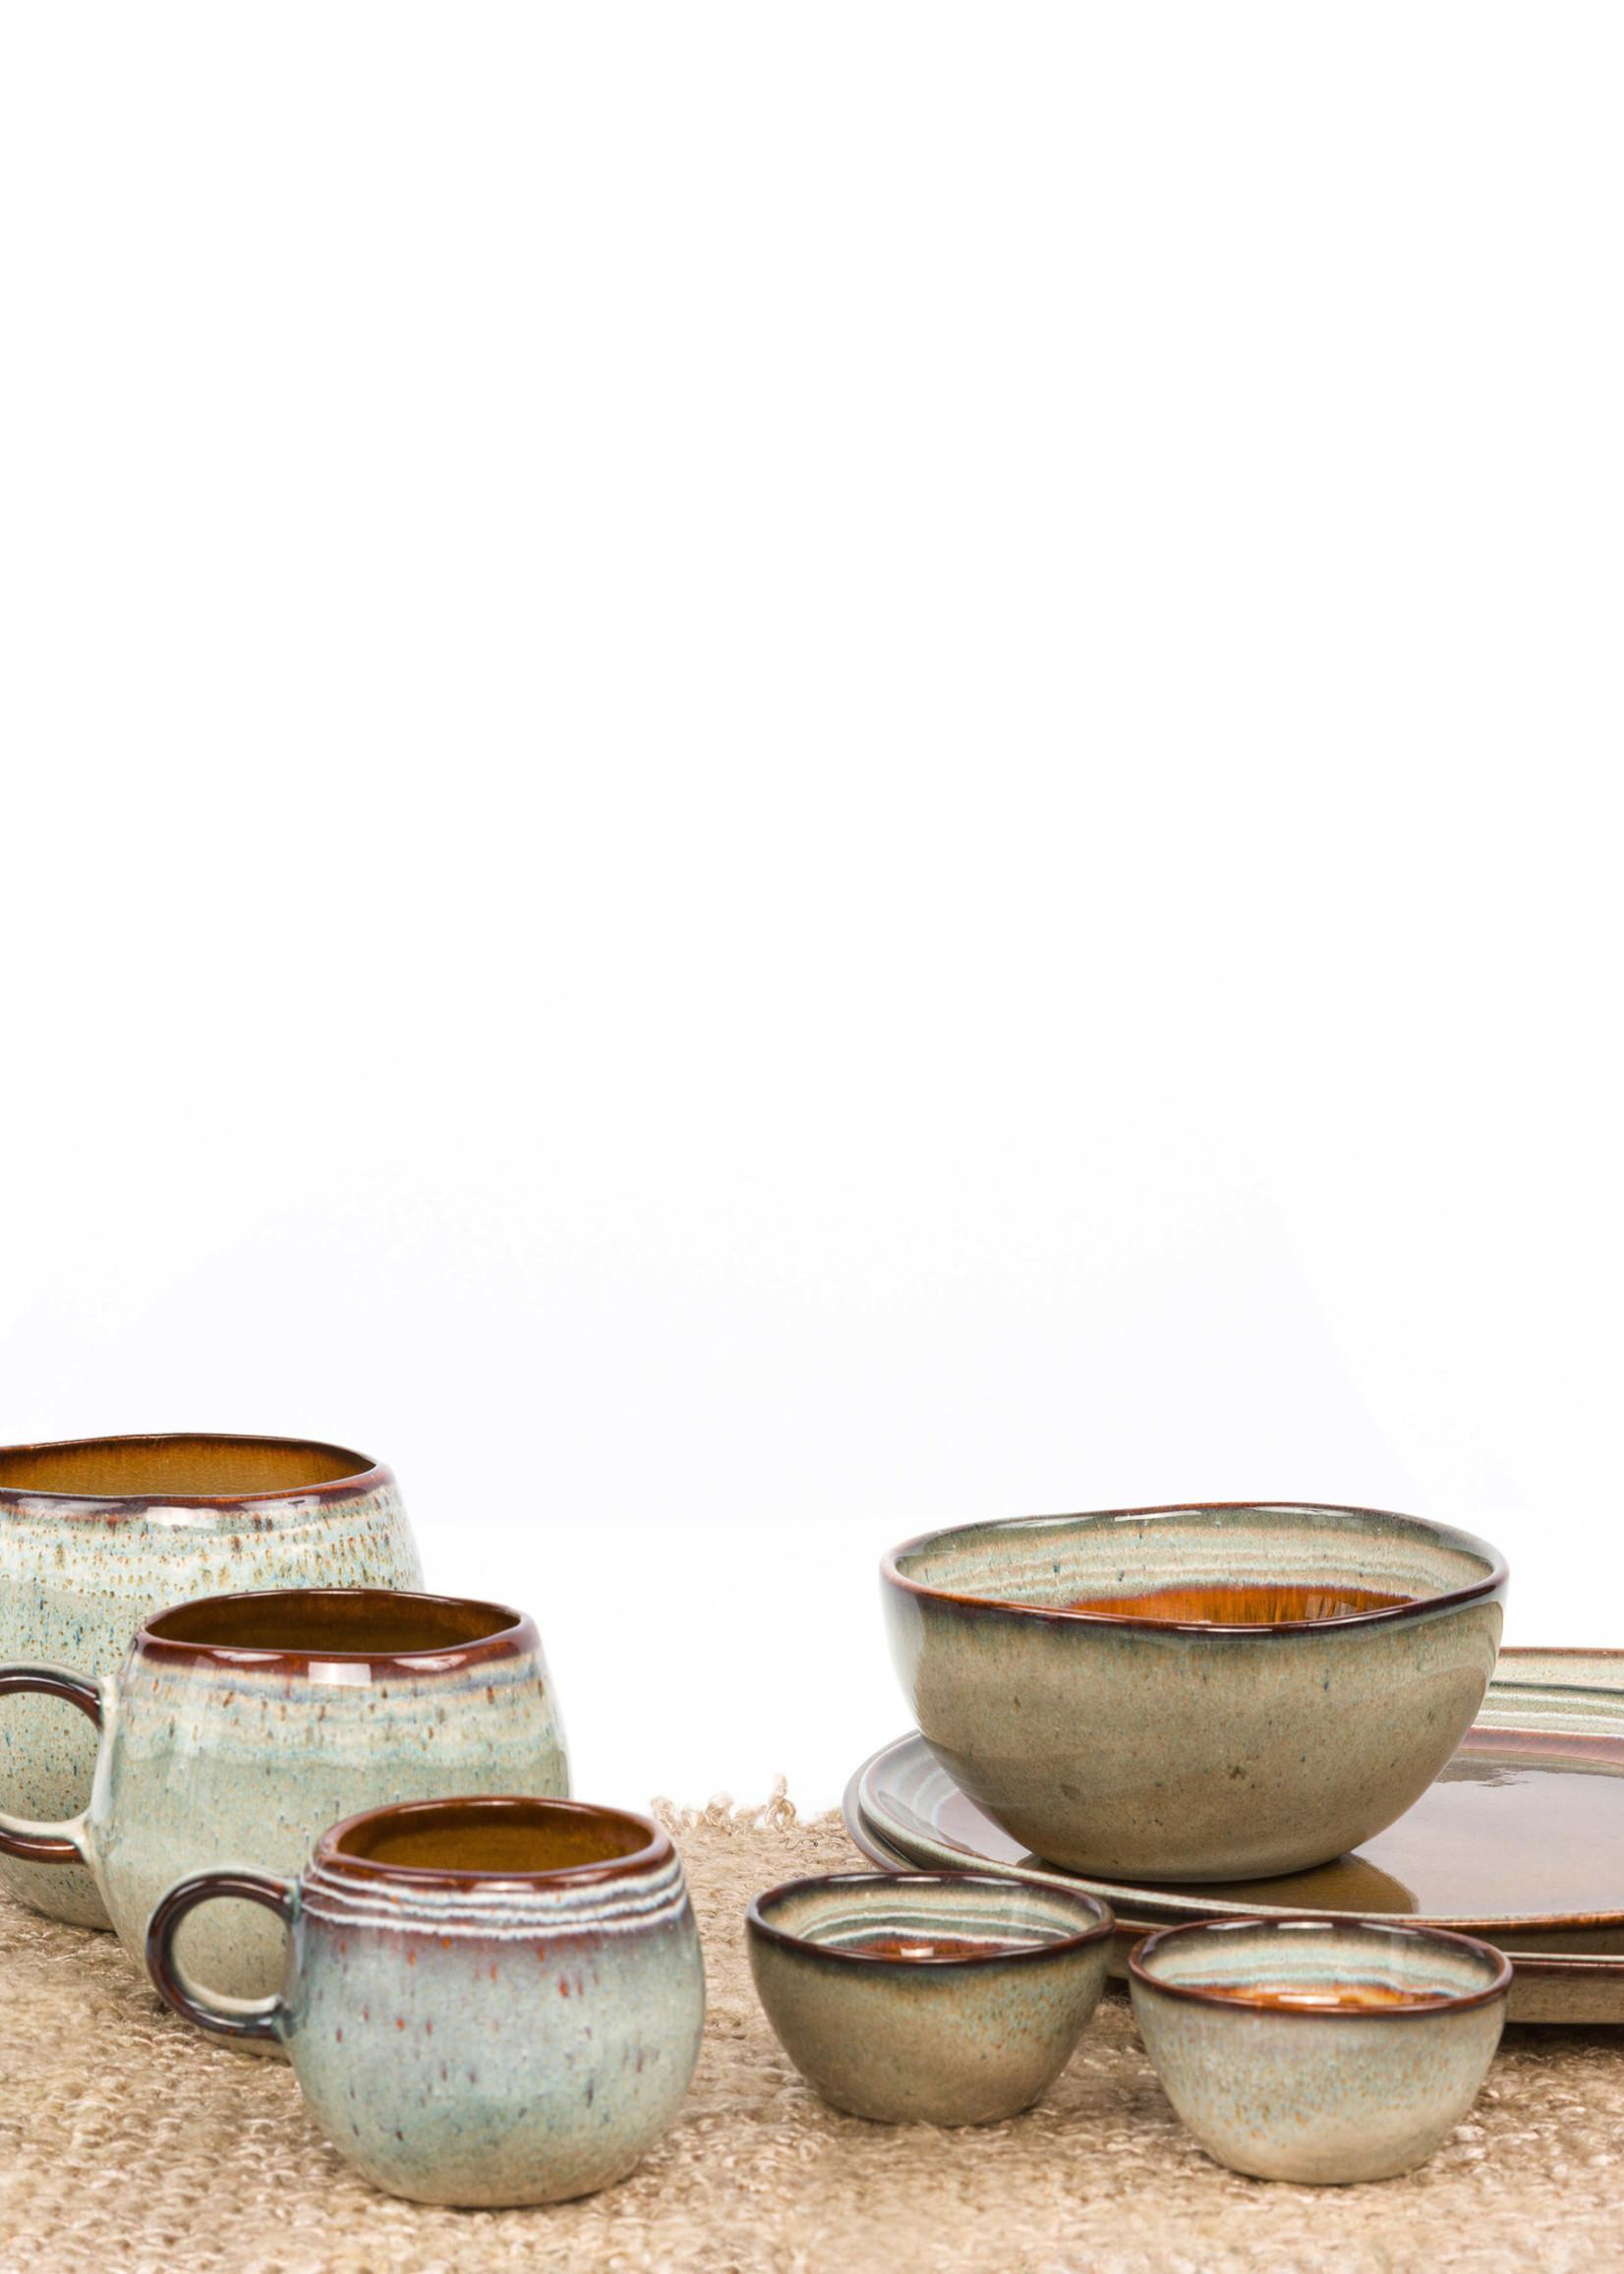 The Comporta Sauce Bowl - XS